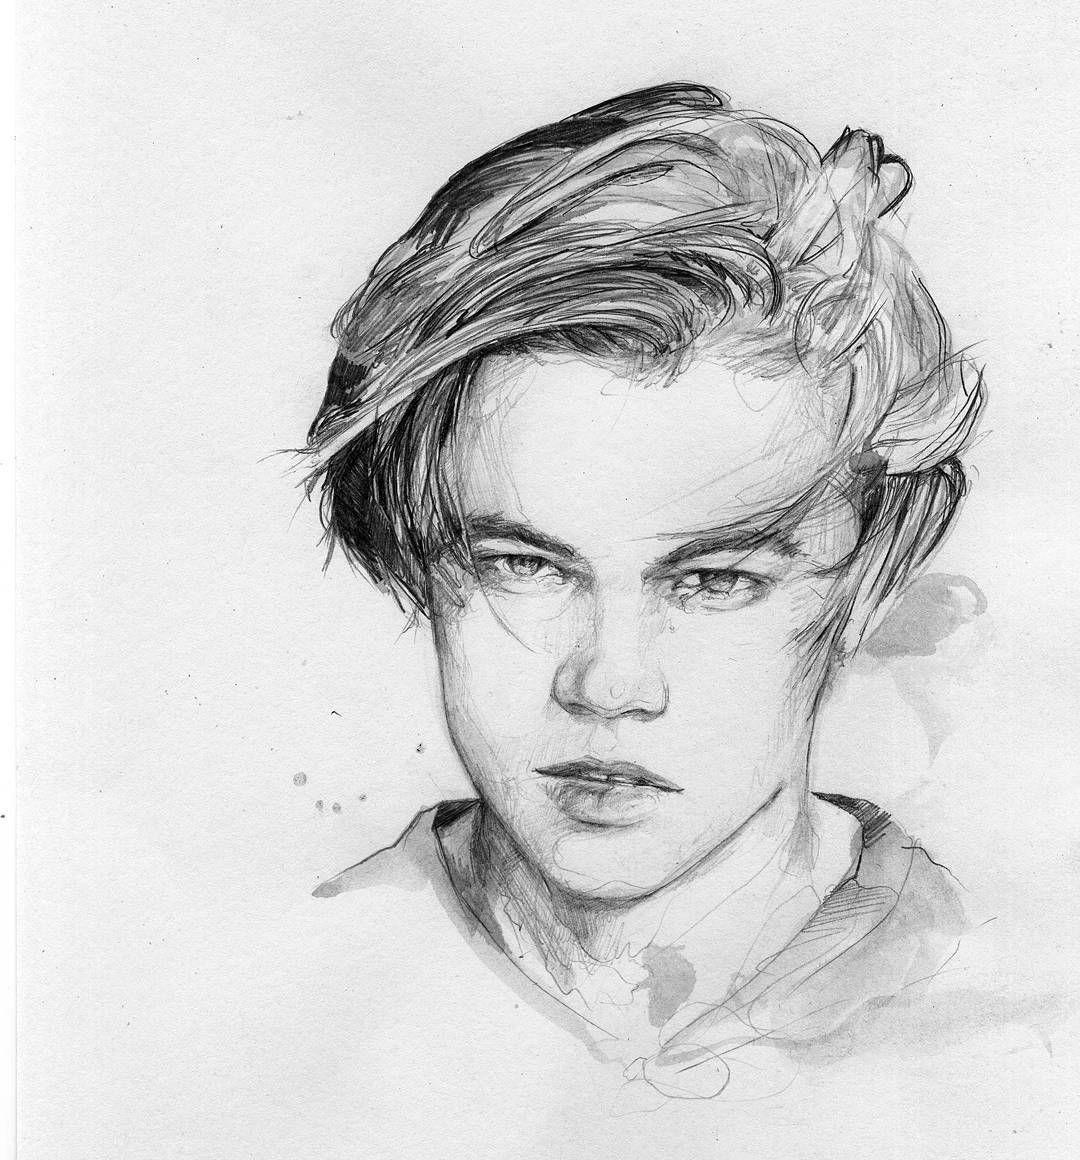 """Someone would think he won an  Oscar! Oh wait. #leo #leonardodicaprio #oscar #wip #drawing #instaart #sketchbook #ink #instadrawing #illustration"""